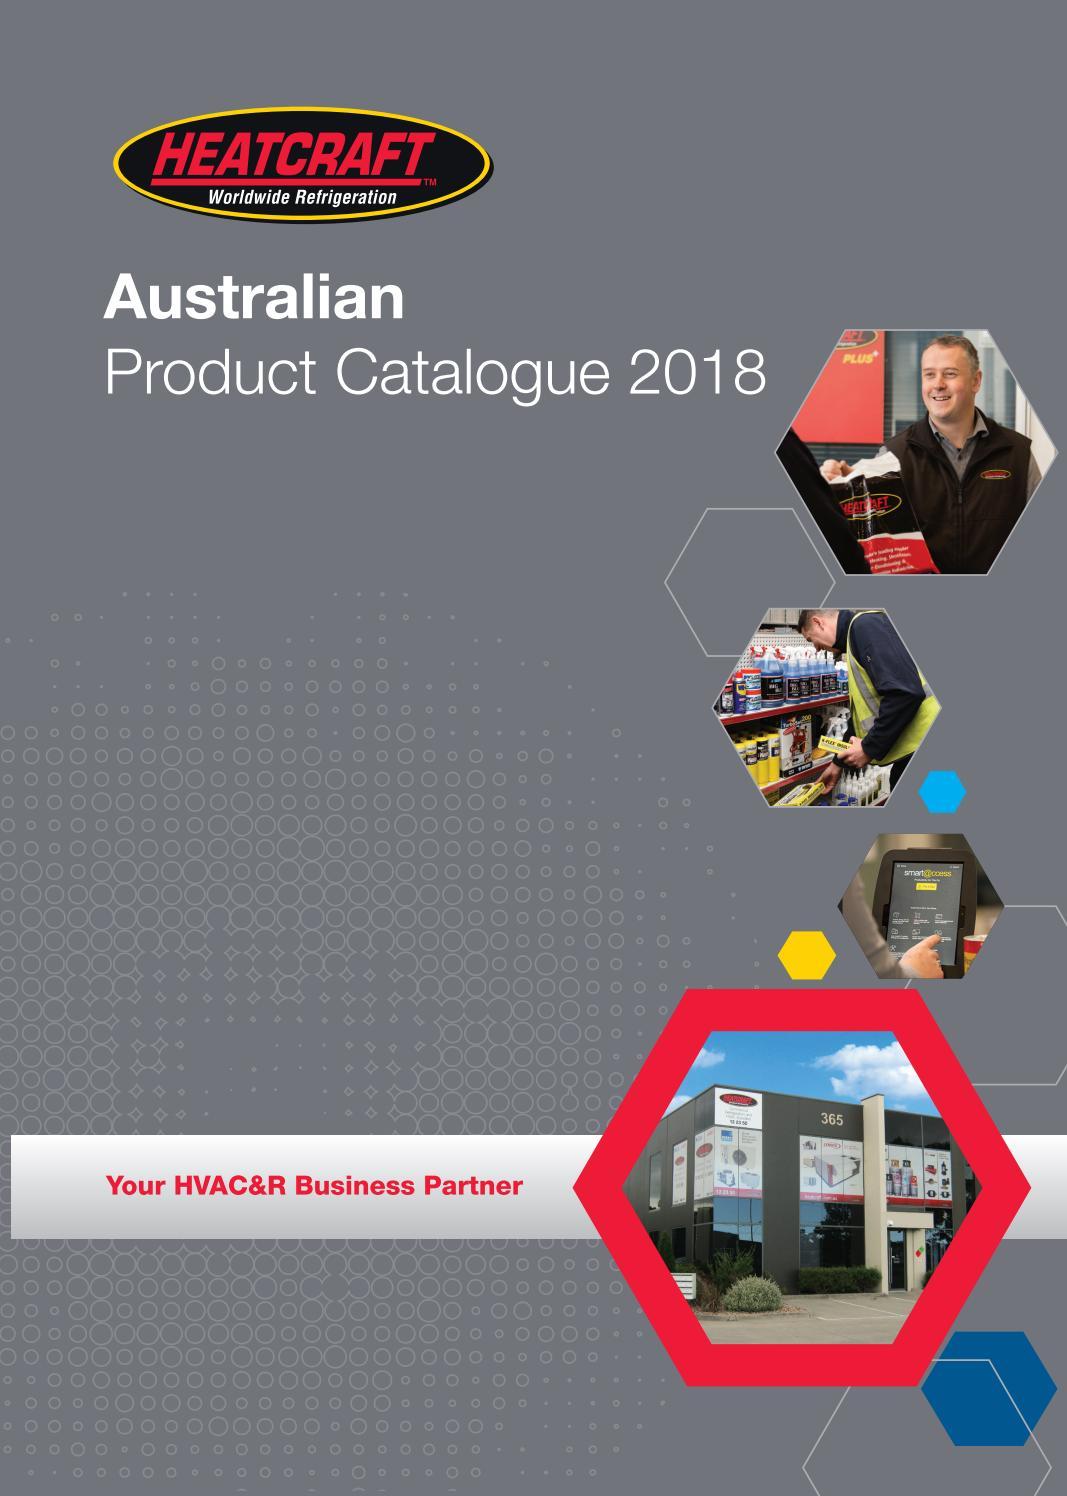 2018 Heatcraft AUS Product Catalogue by Kirby HVAC&R Pty Ltd - Issuu